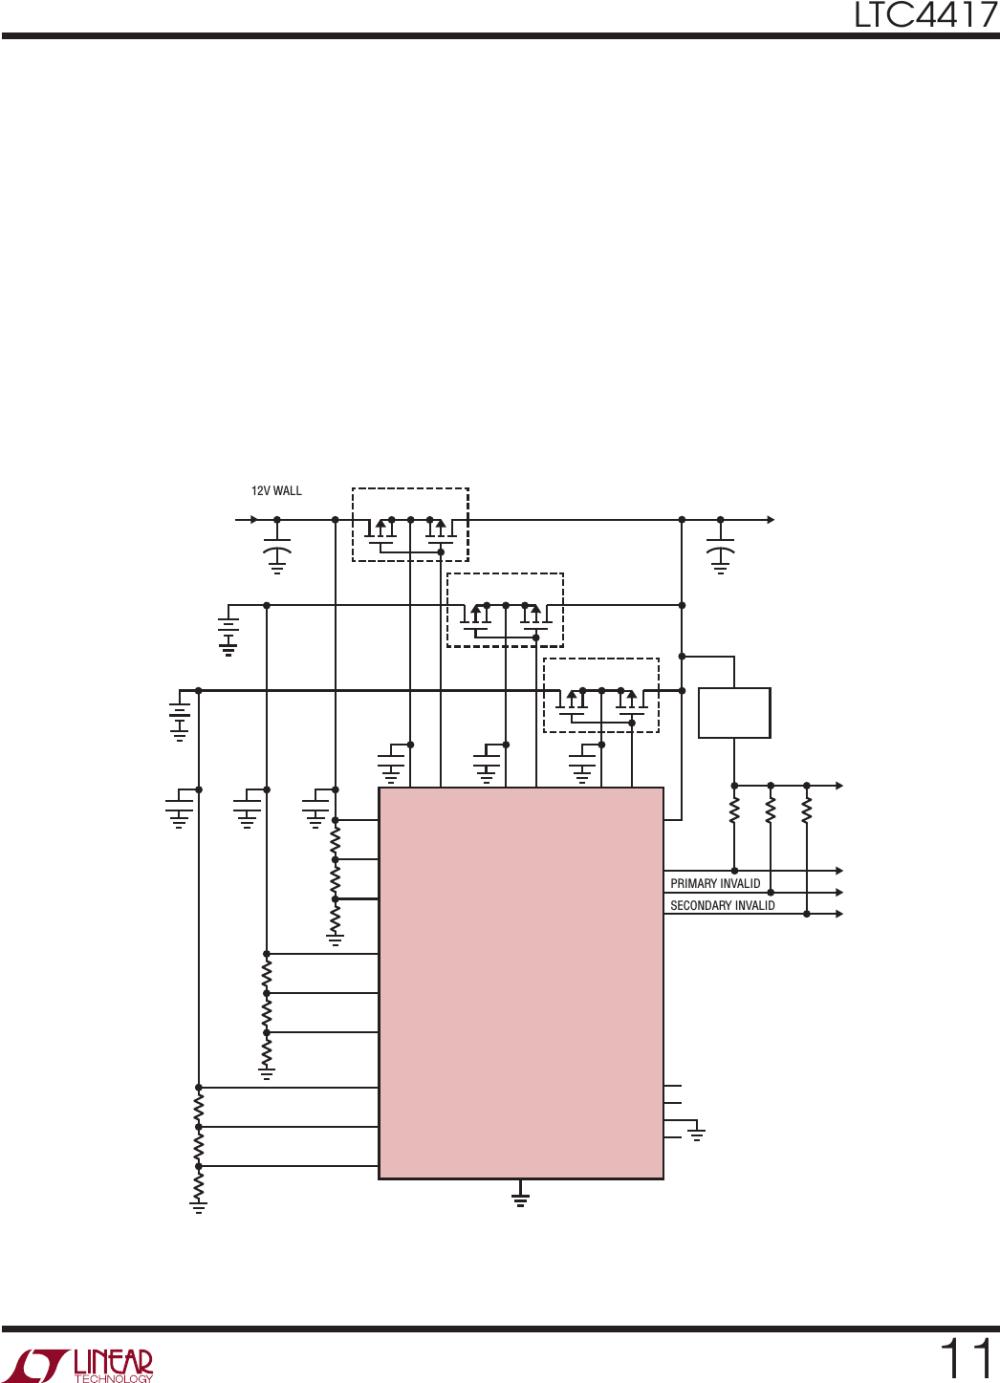 medium resolution of ltc4417 datasheet linear tech adi digikey figure 4 circuit diagram of battery supply 12v alkaline and 84v